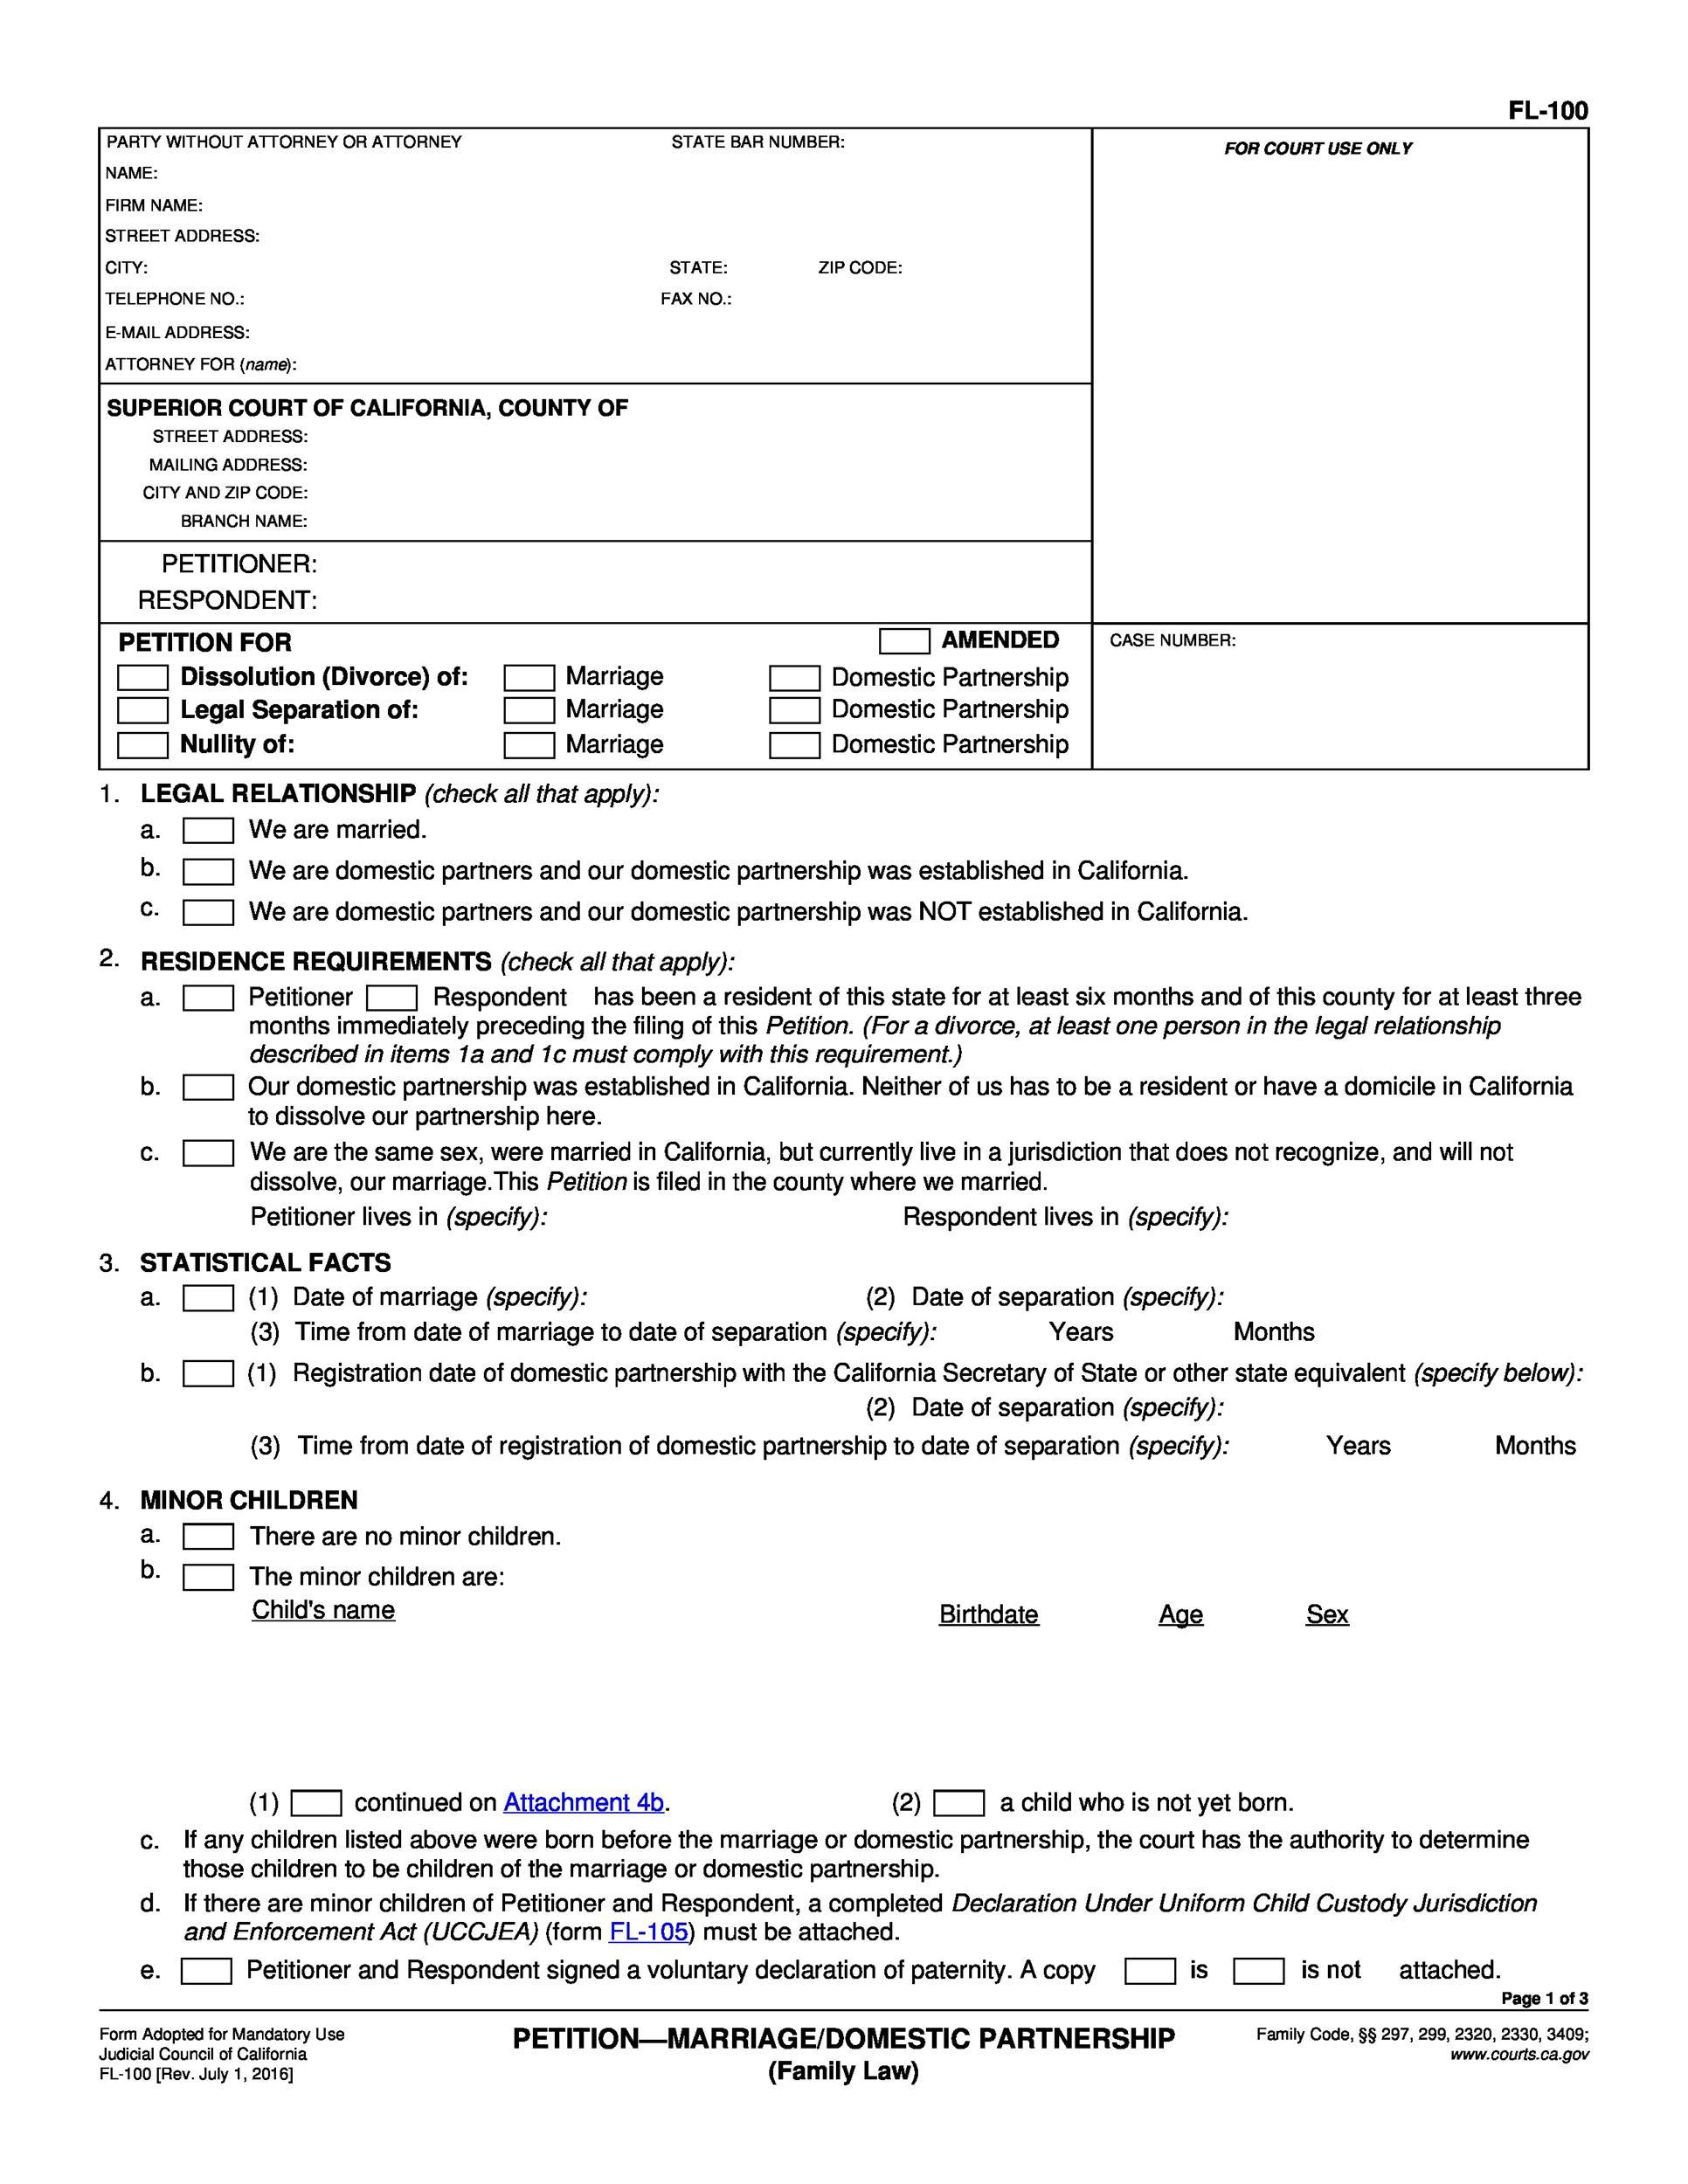 Doc12831658 Free Fake Divorce Certificate 7 free online – Free Fake Divorce Certificate